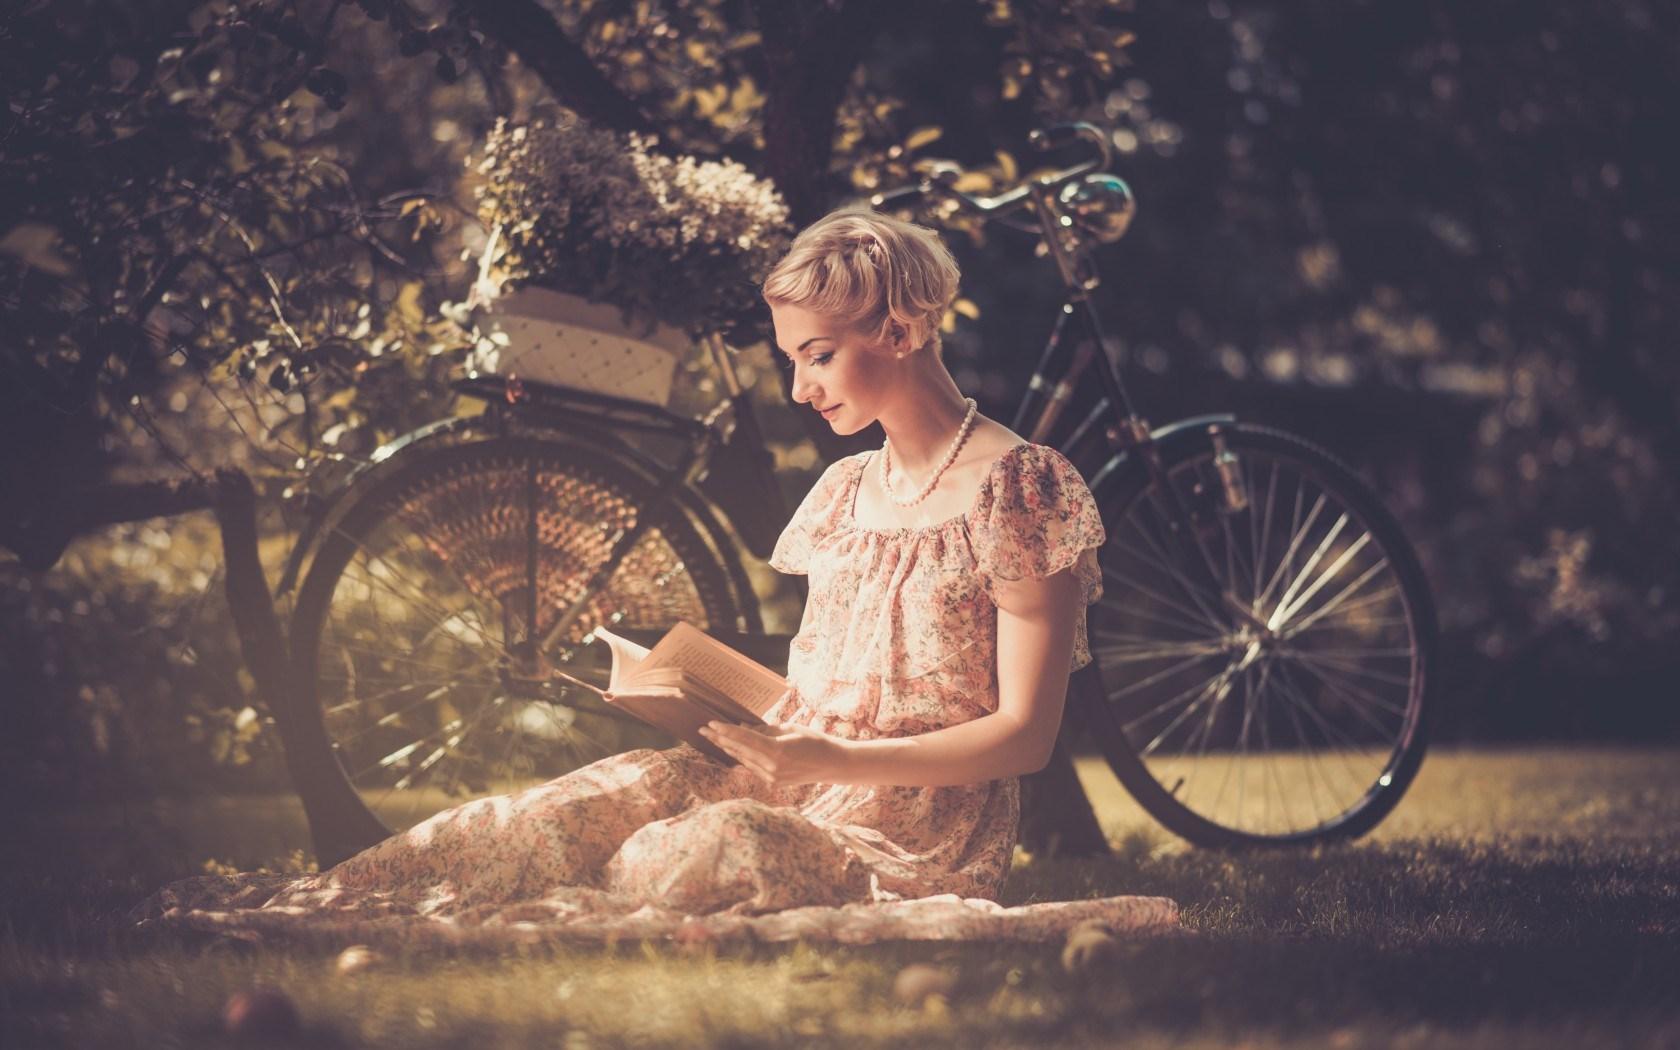 Girl Blonde Long Summer Dress Bicycle Reading Book Hd